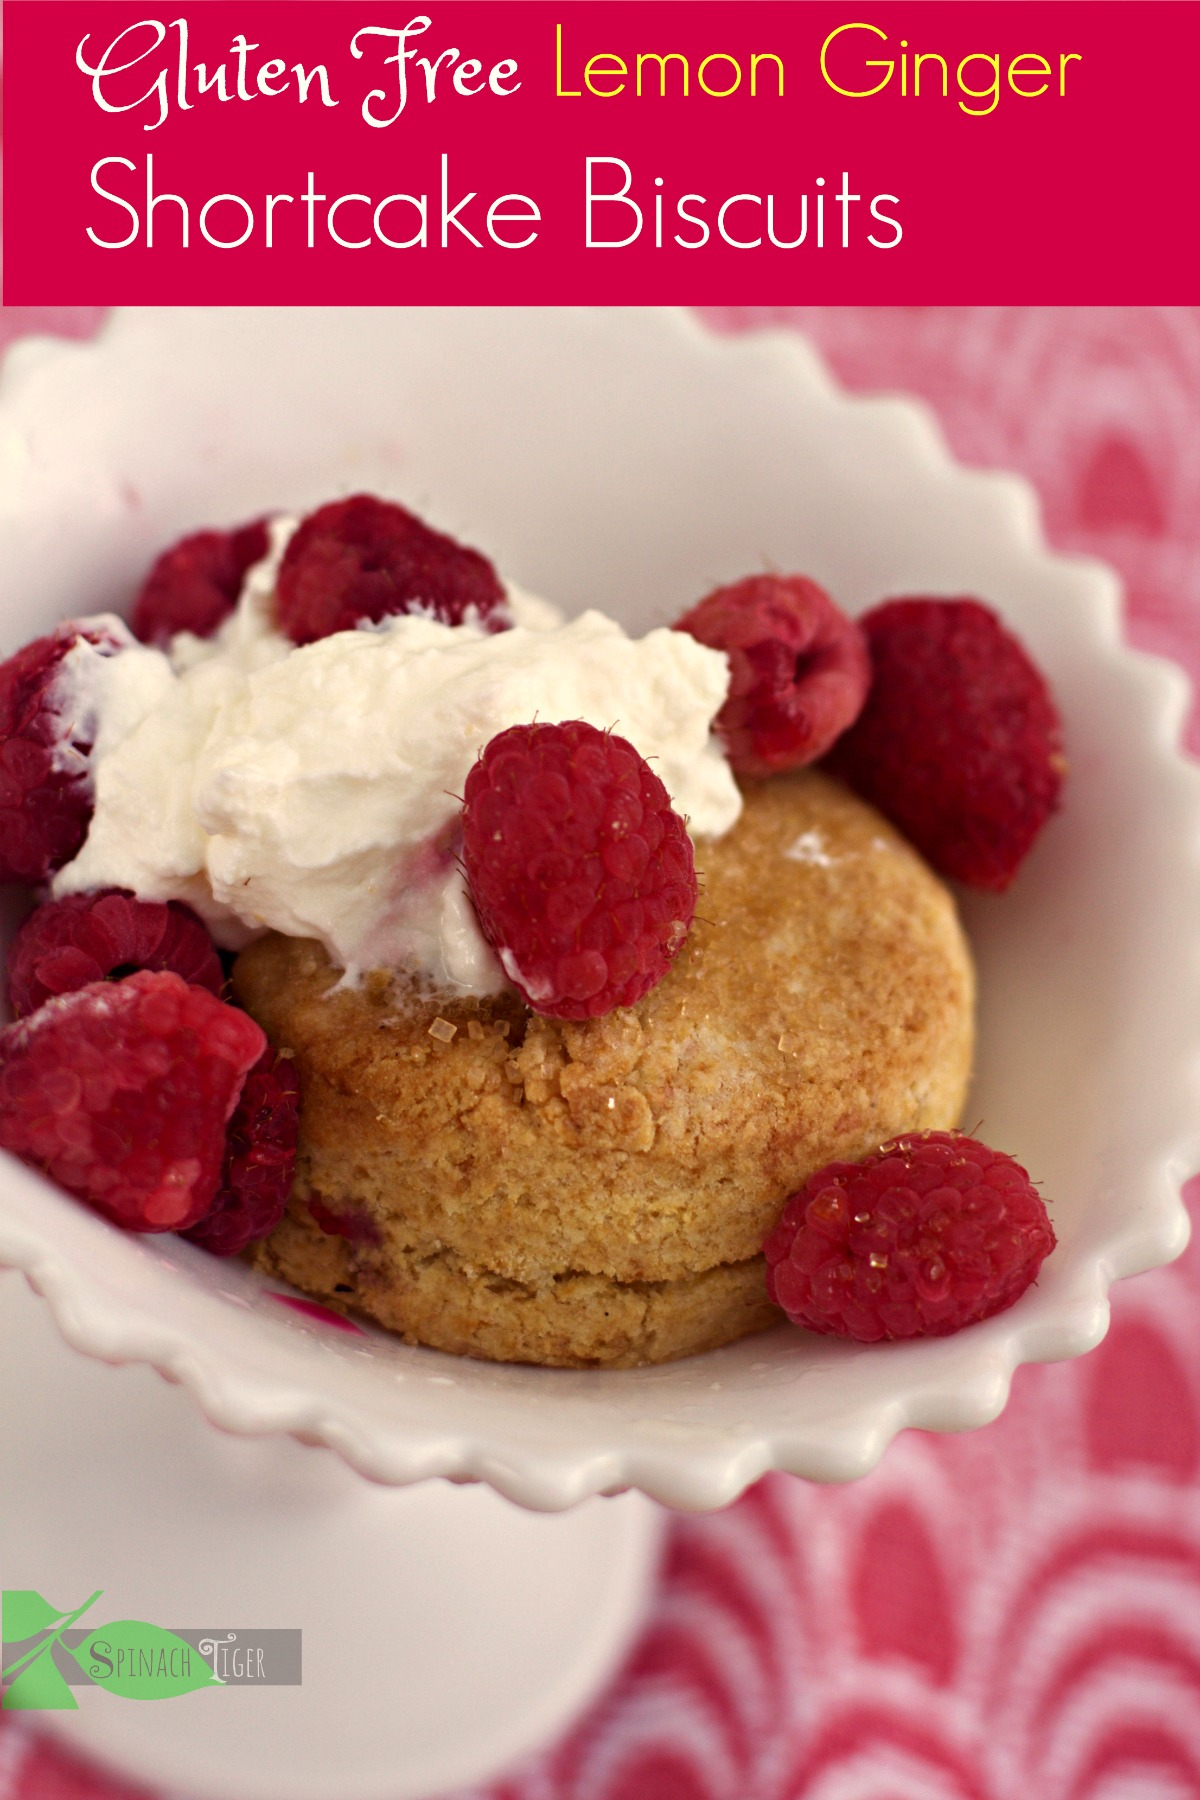 Lemon Ginger Gluten Free Shortcake Biscuits